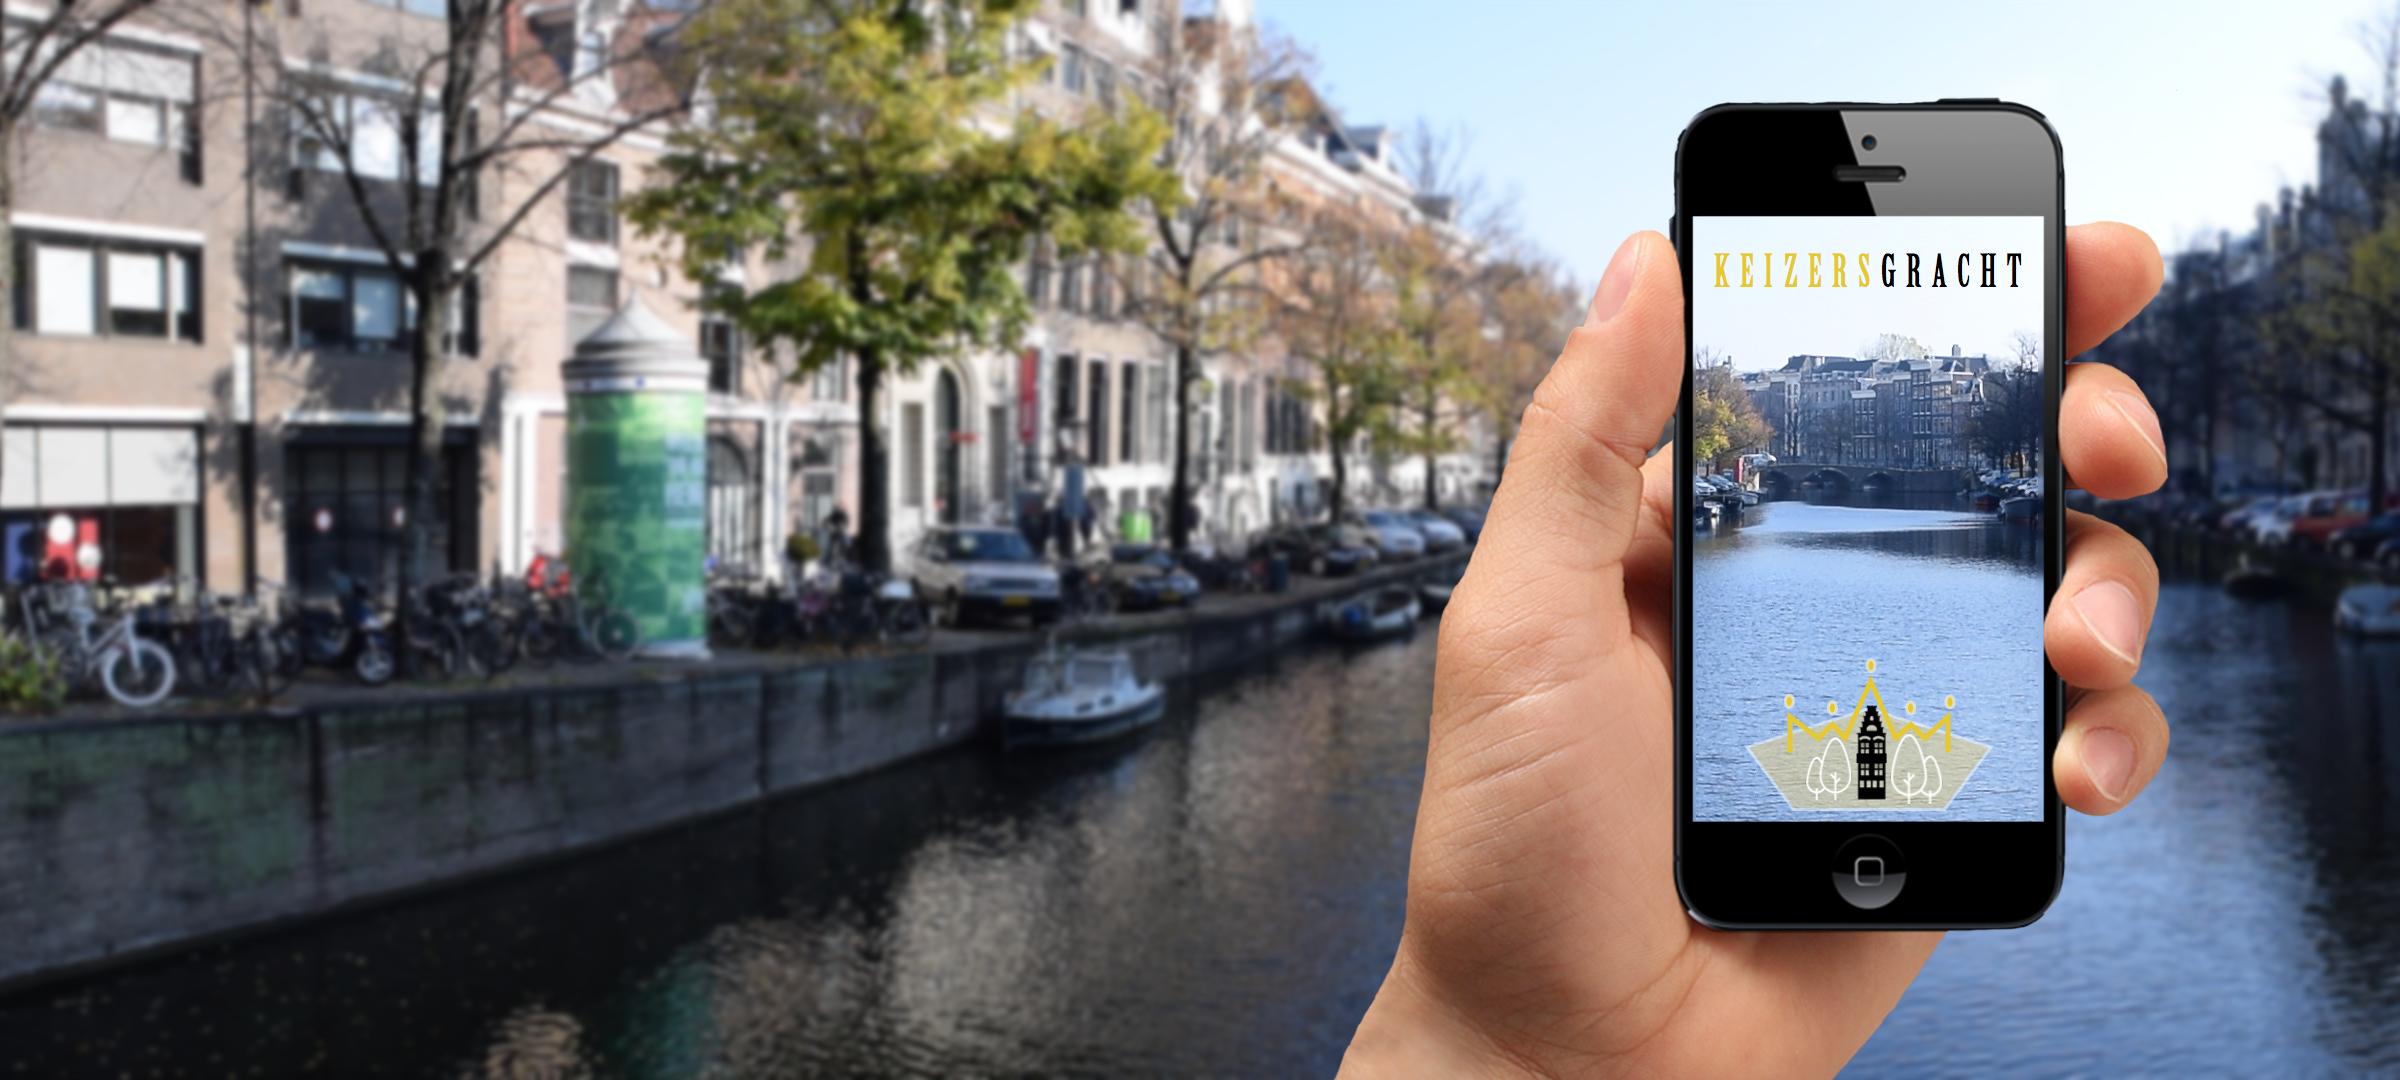 Snapchat Geofilter Keizersgracht